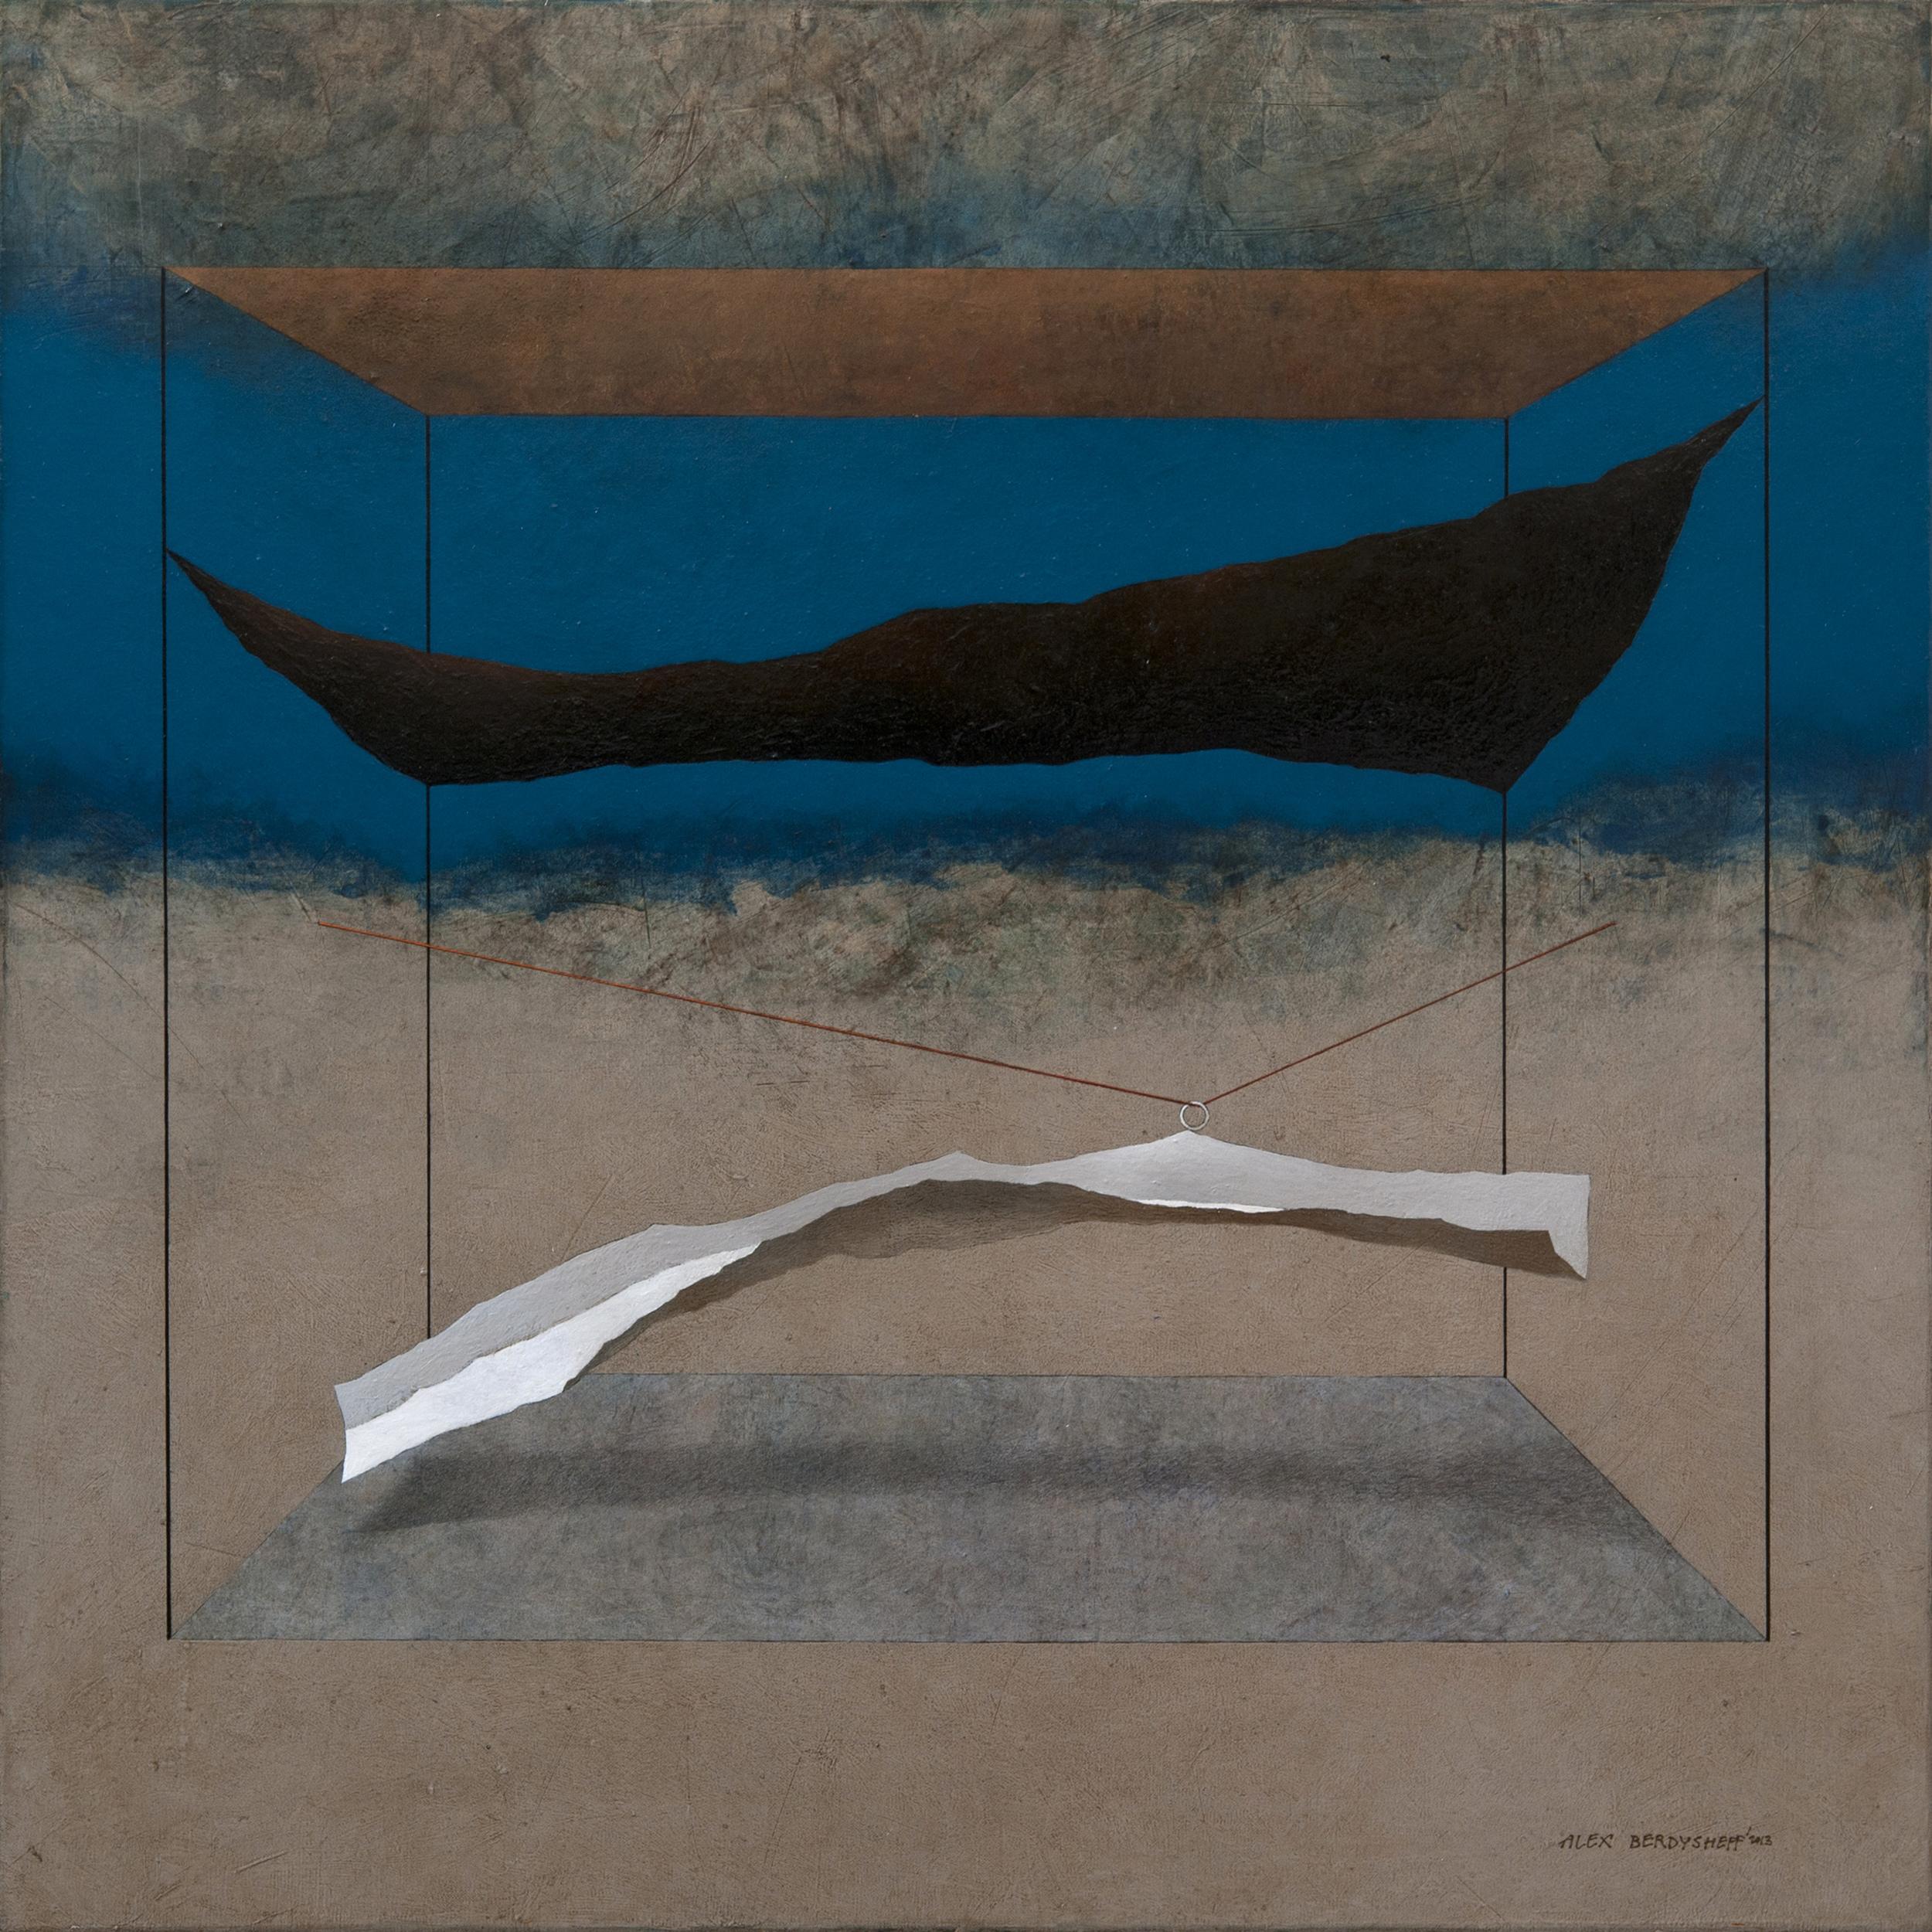 Night, oil on canvas, 85x85 cm, 2013